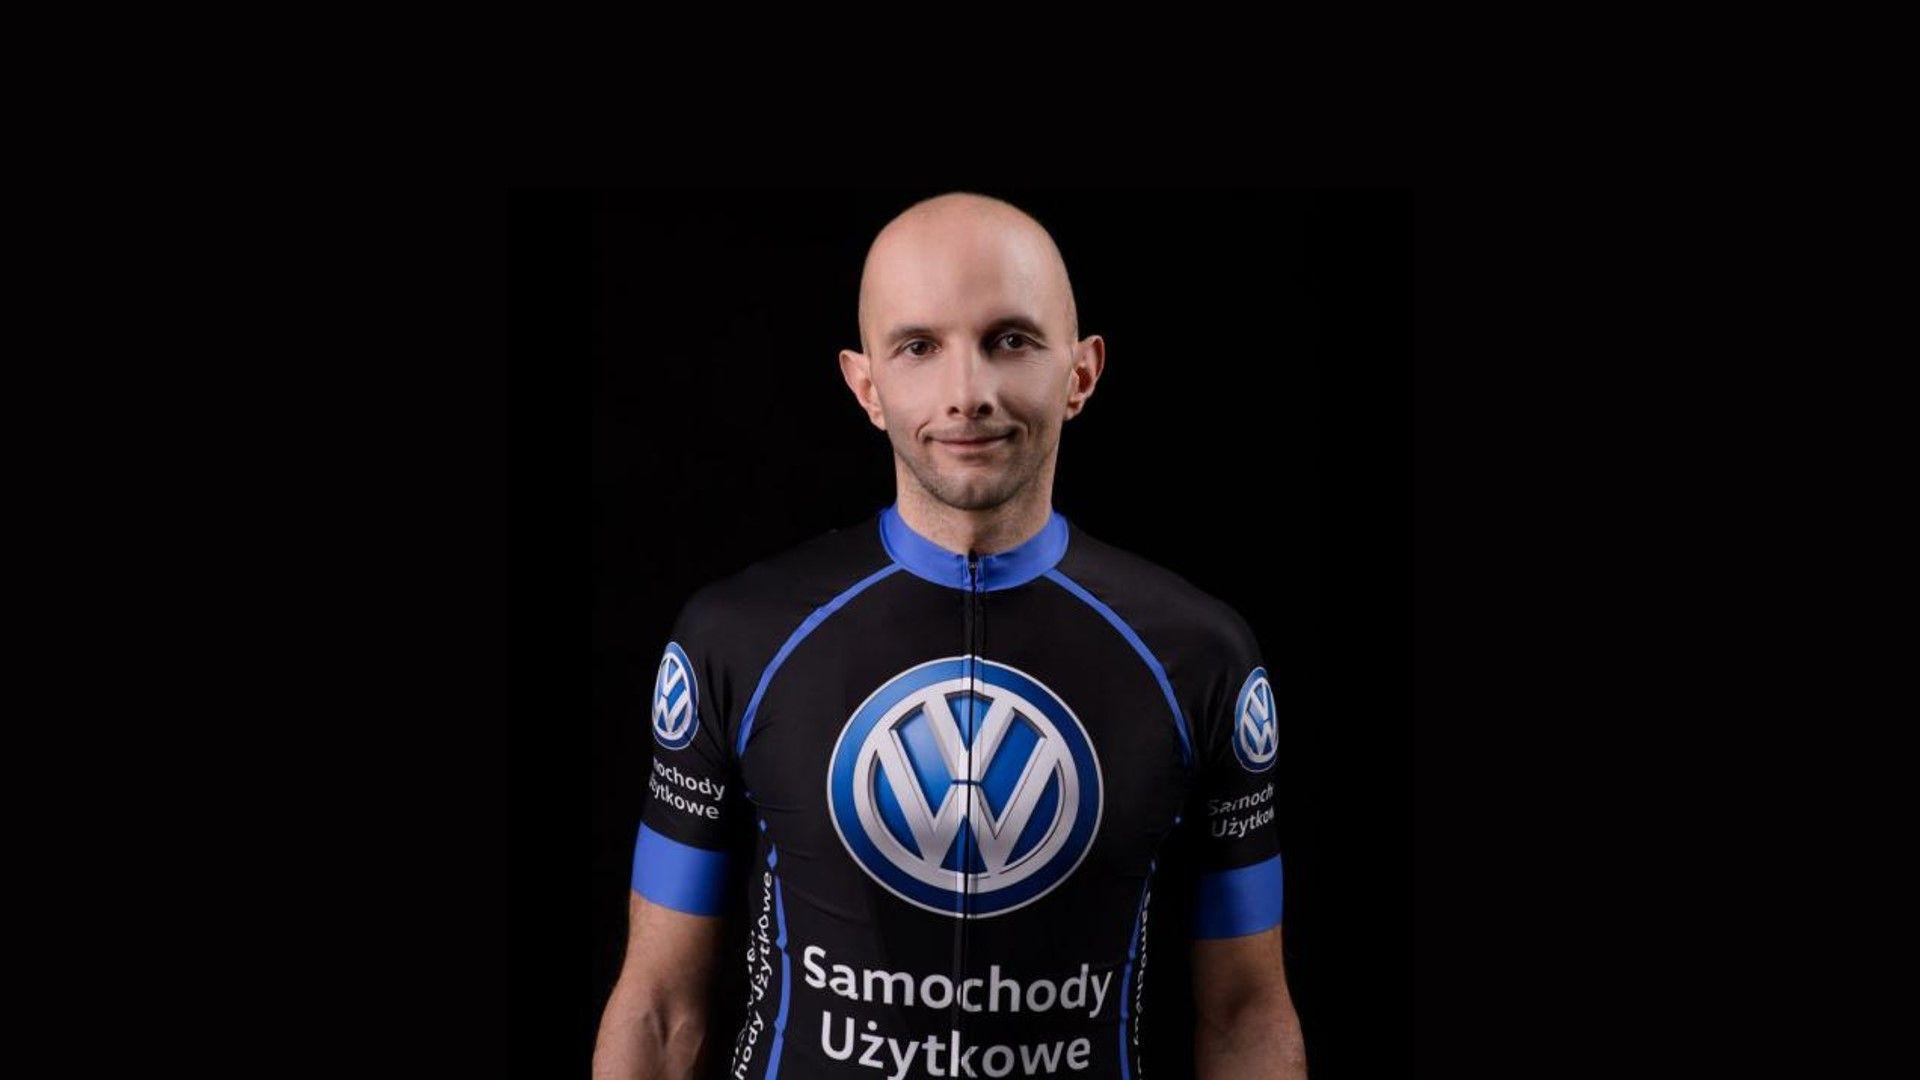 Bogdan Czarnota (Volkswagen Samochody Użytkowe MTB Team) – Puchar Polski, CX Katowice